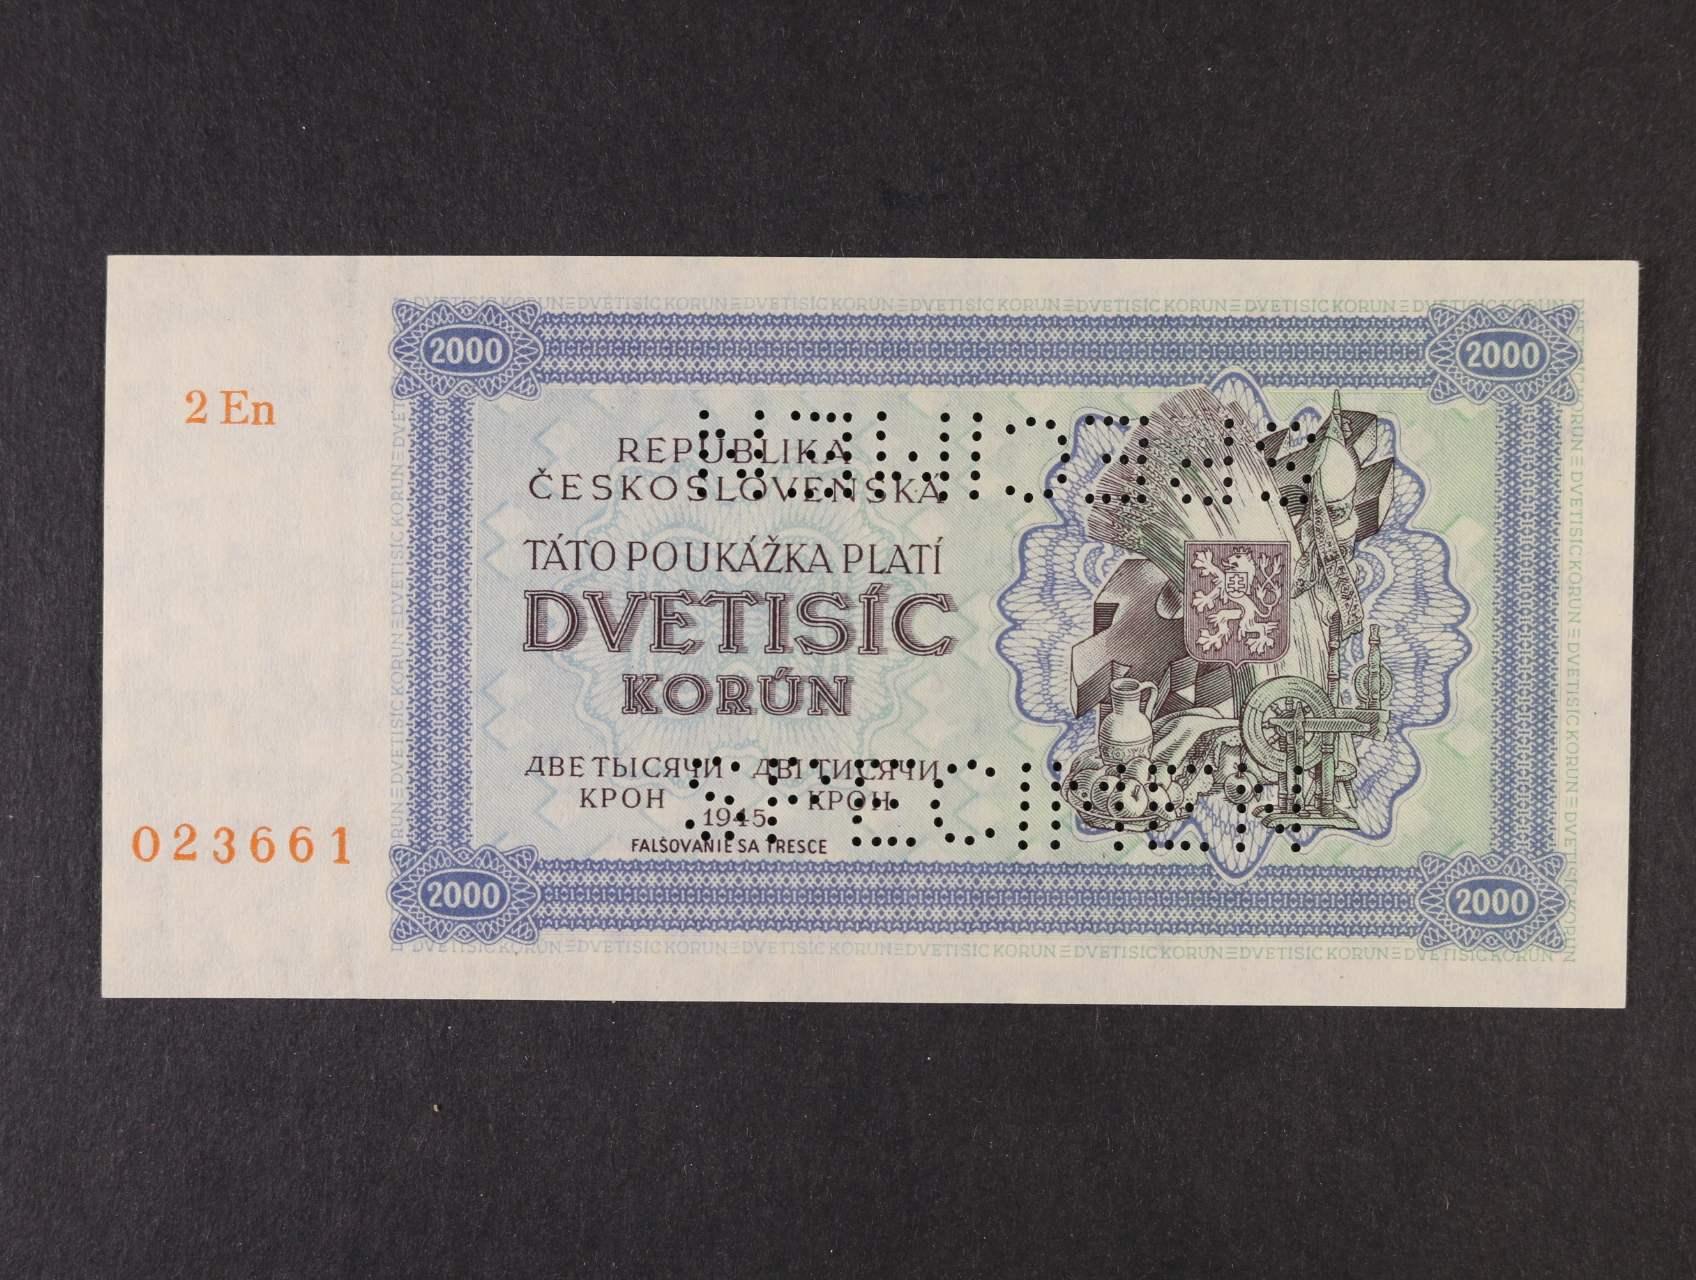 2000 K 1945 série 2En 023661 poukázka s 2x perf. SPECIMEN - bankovní vzor, poloha vodoznaku A, Ba. 69a, Pi. 50As, Ka. 66a